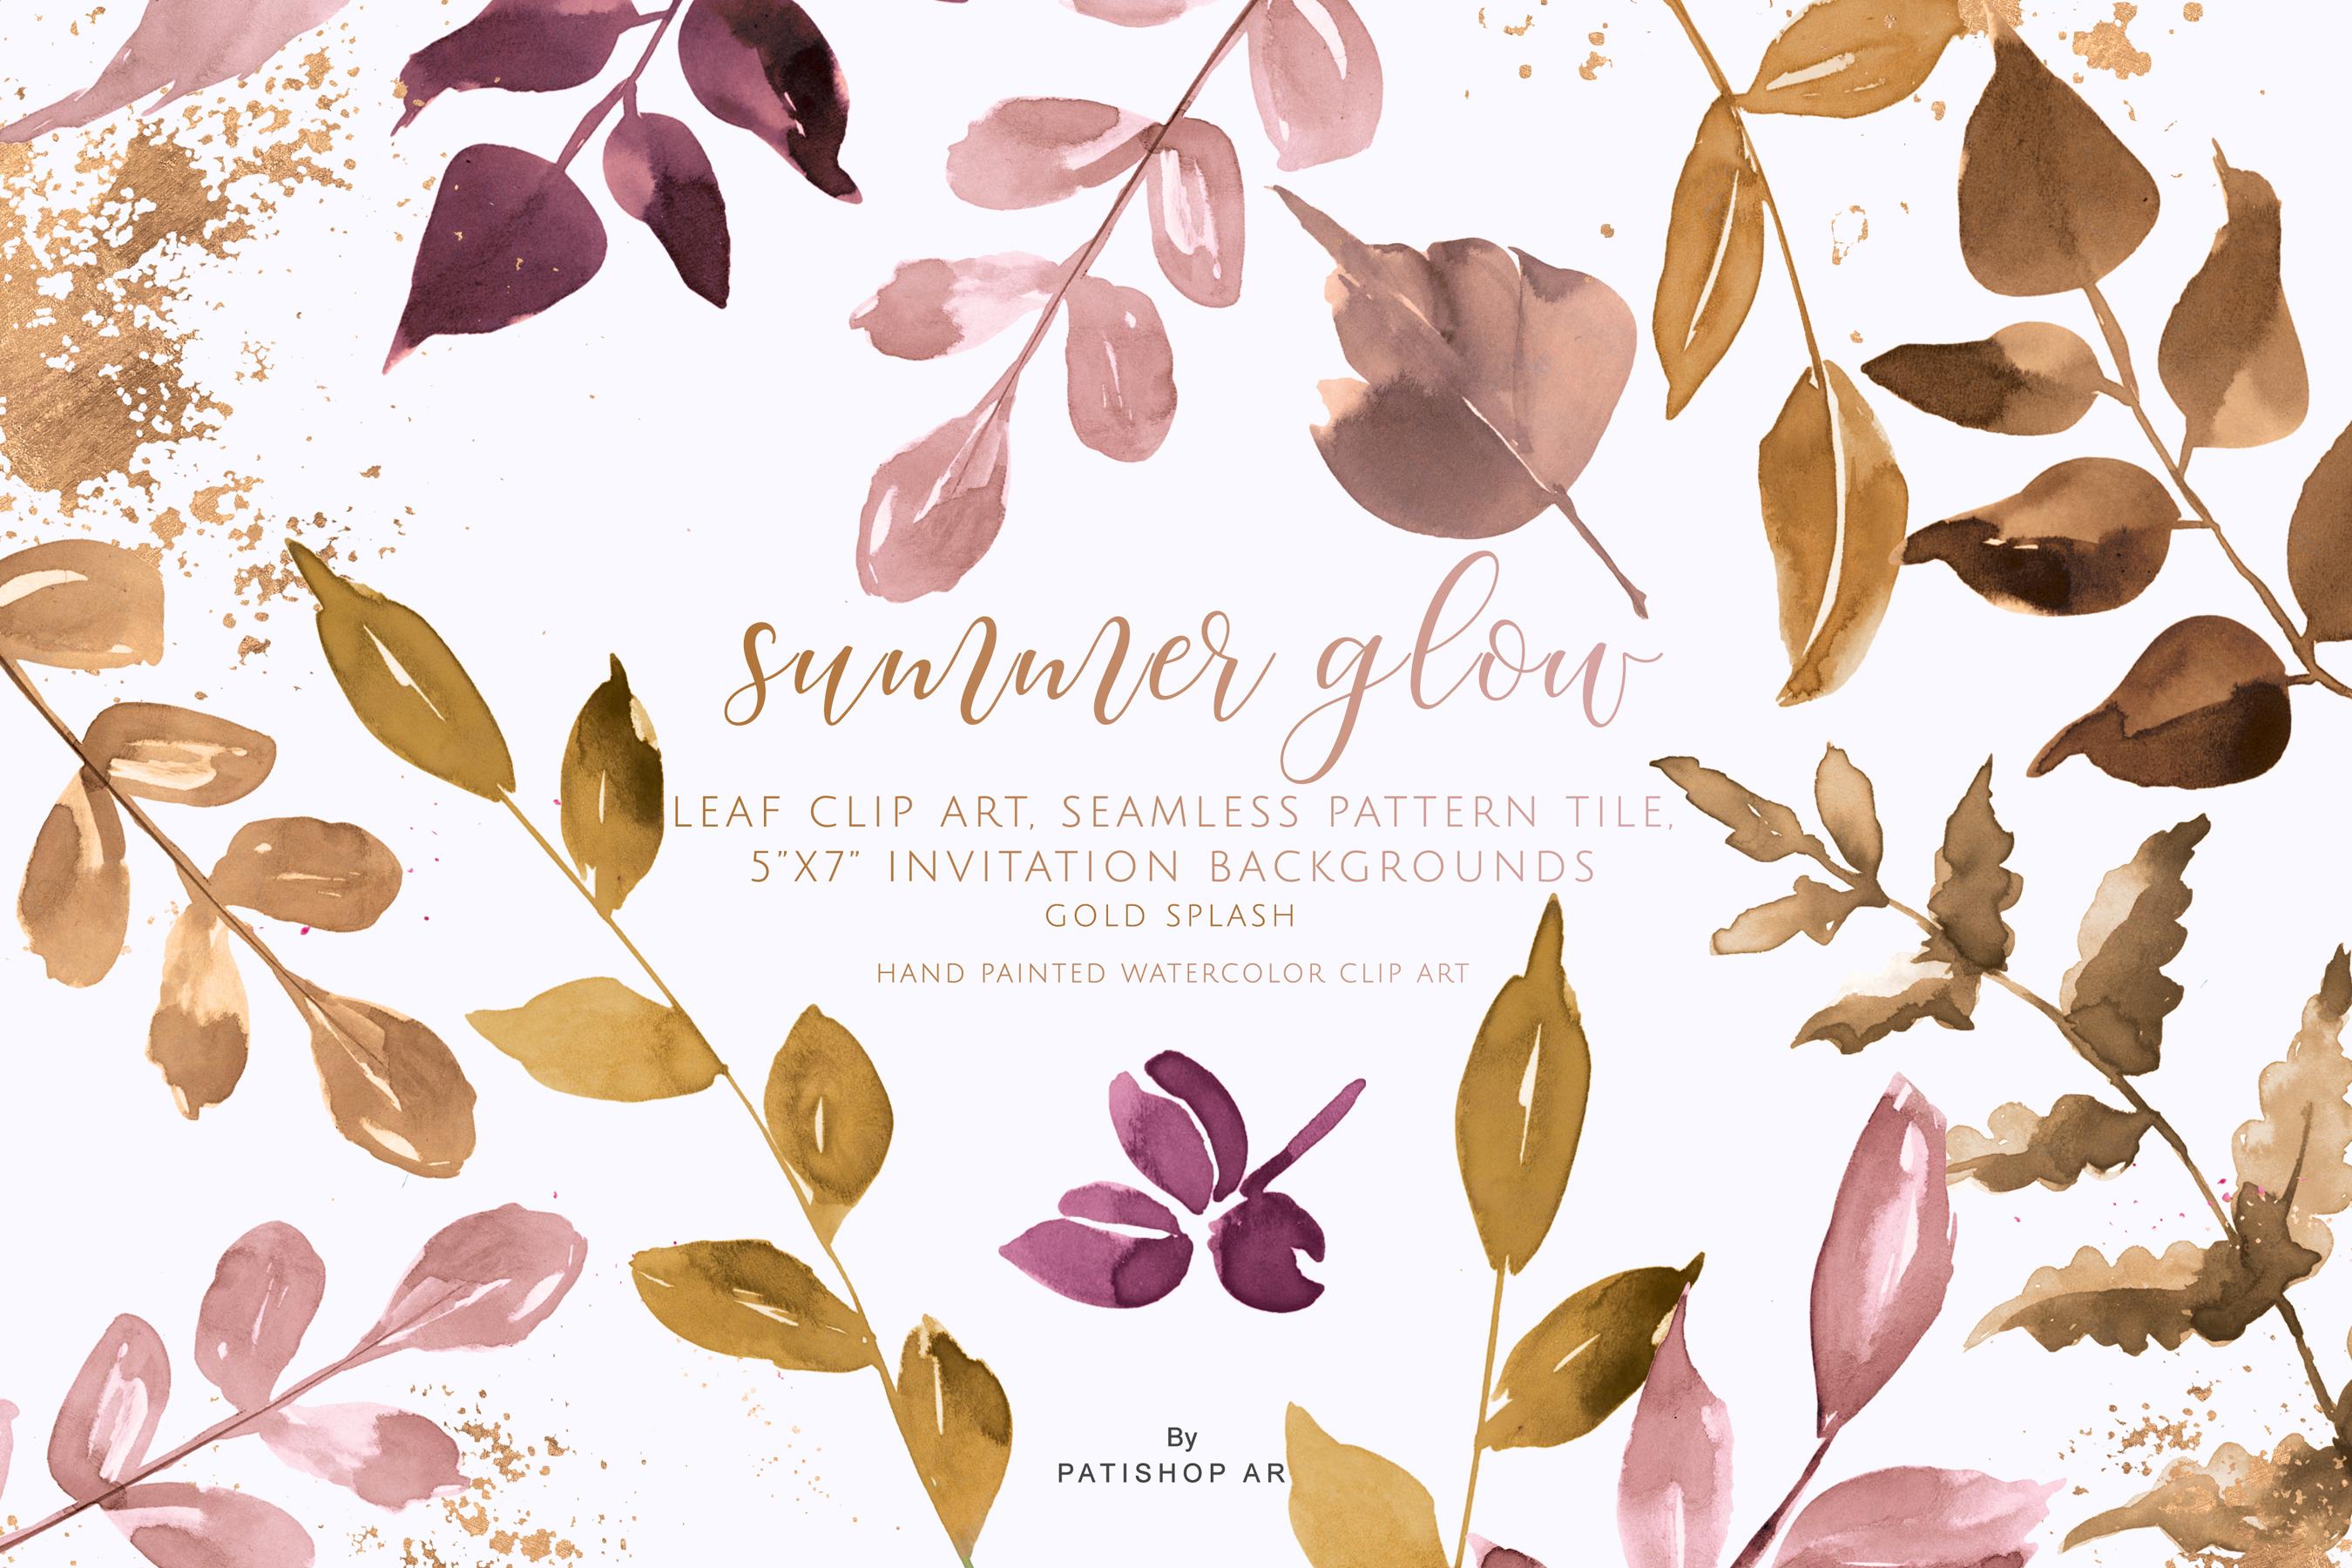 Gold & Blush Leaf Clipart Pattern Invitation Backgrounds.